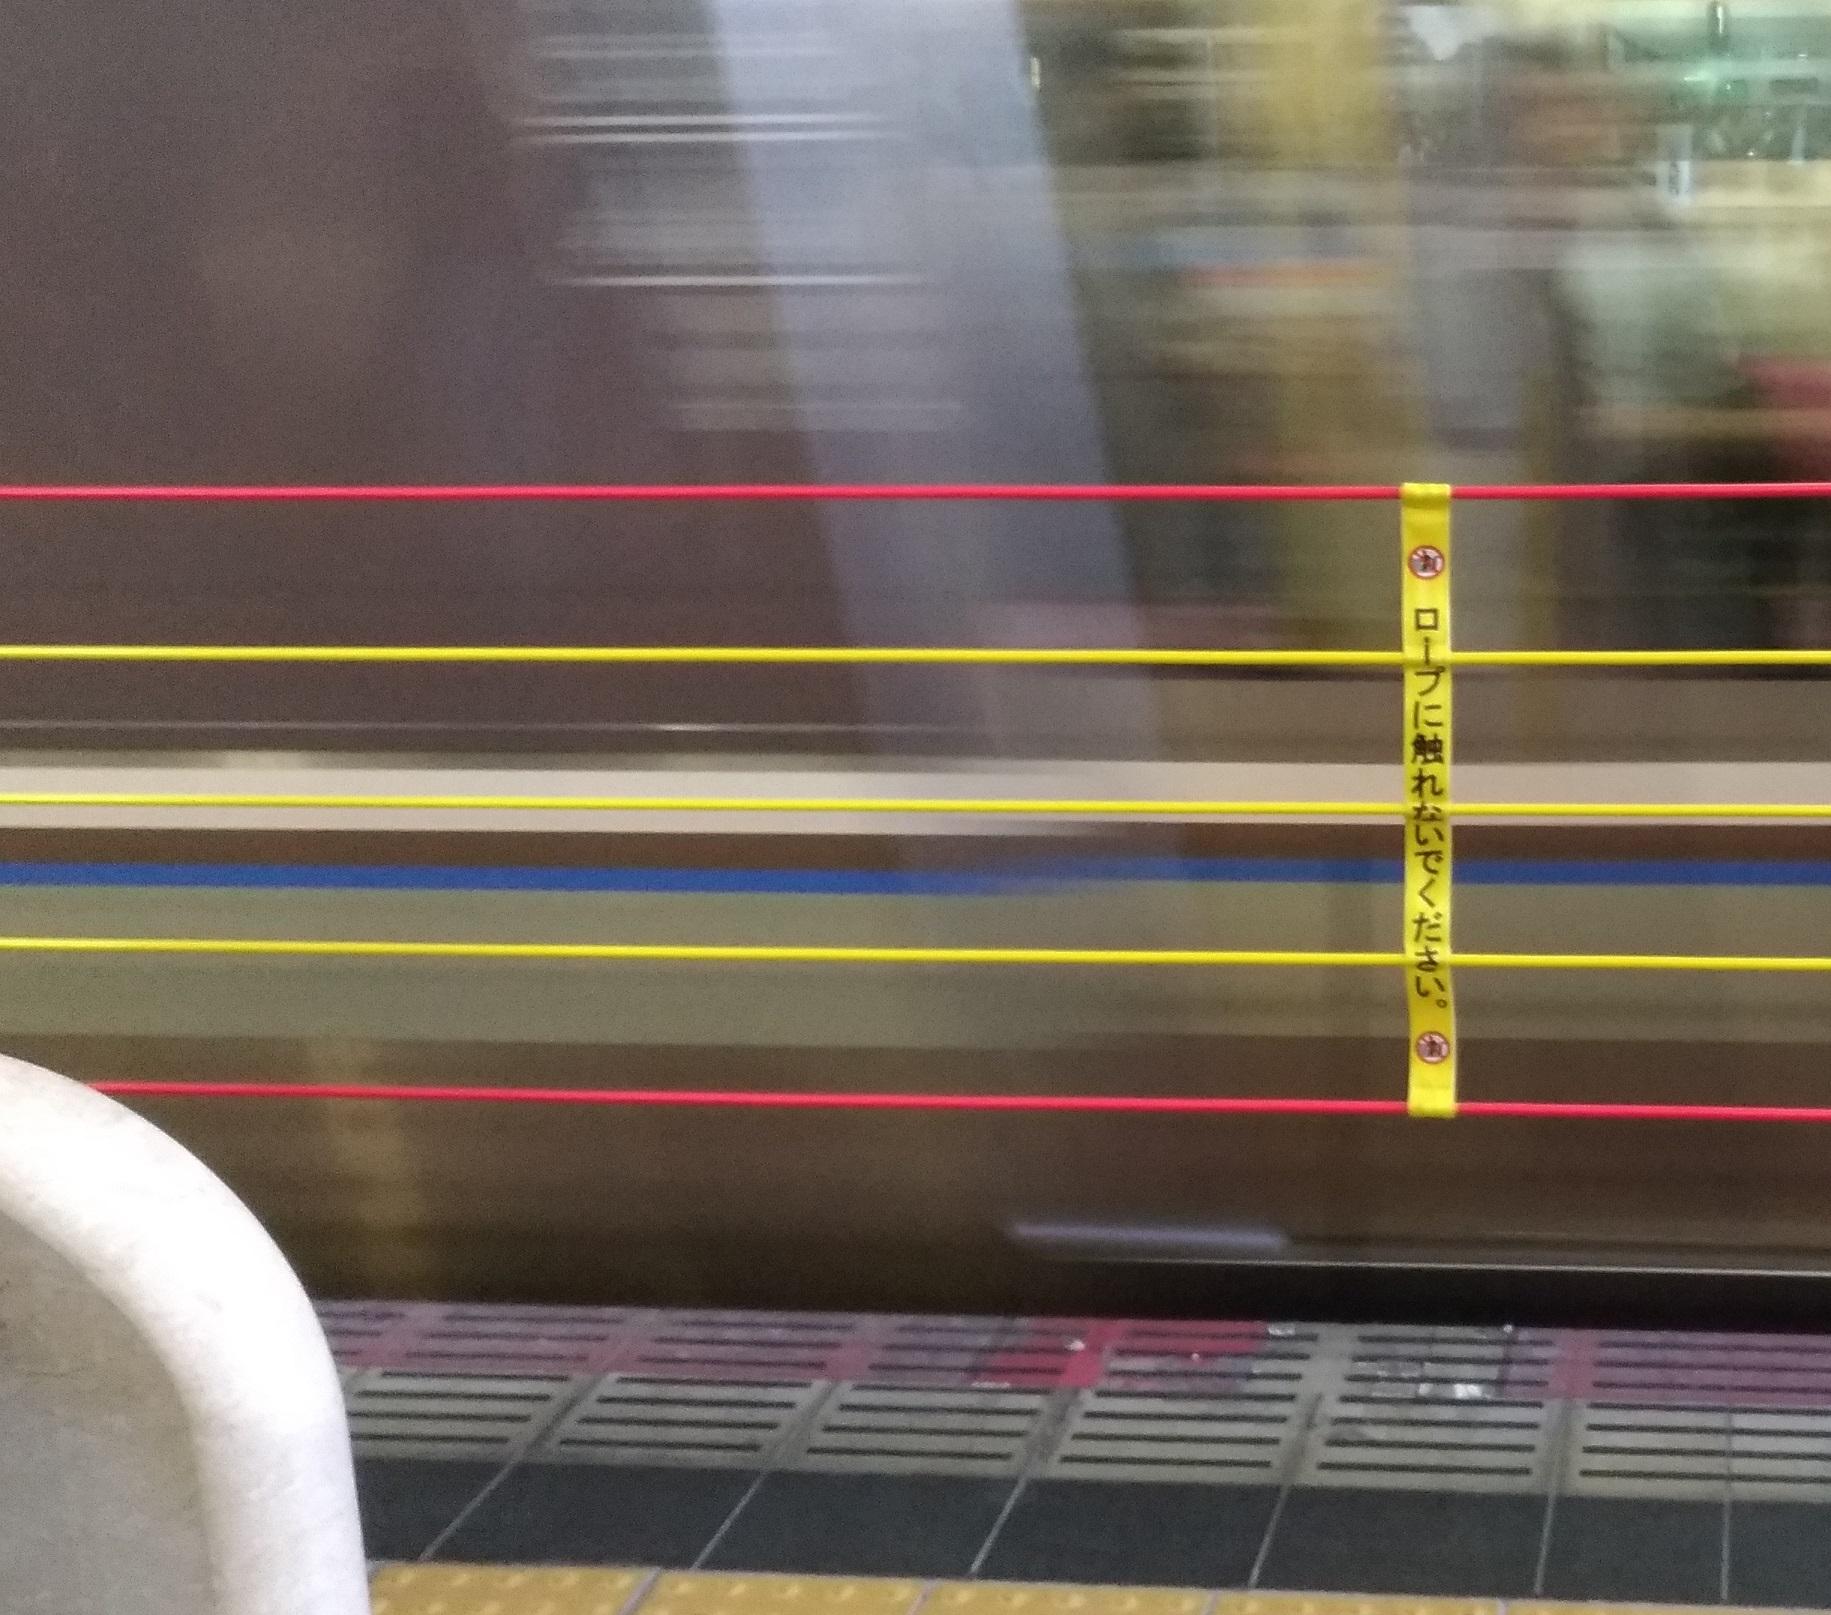 shin_osaka_umeda_train_3.jpg